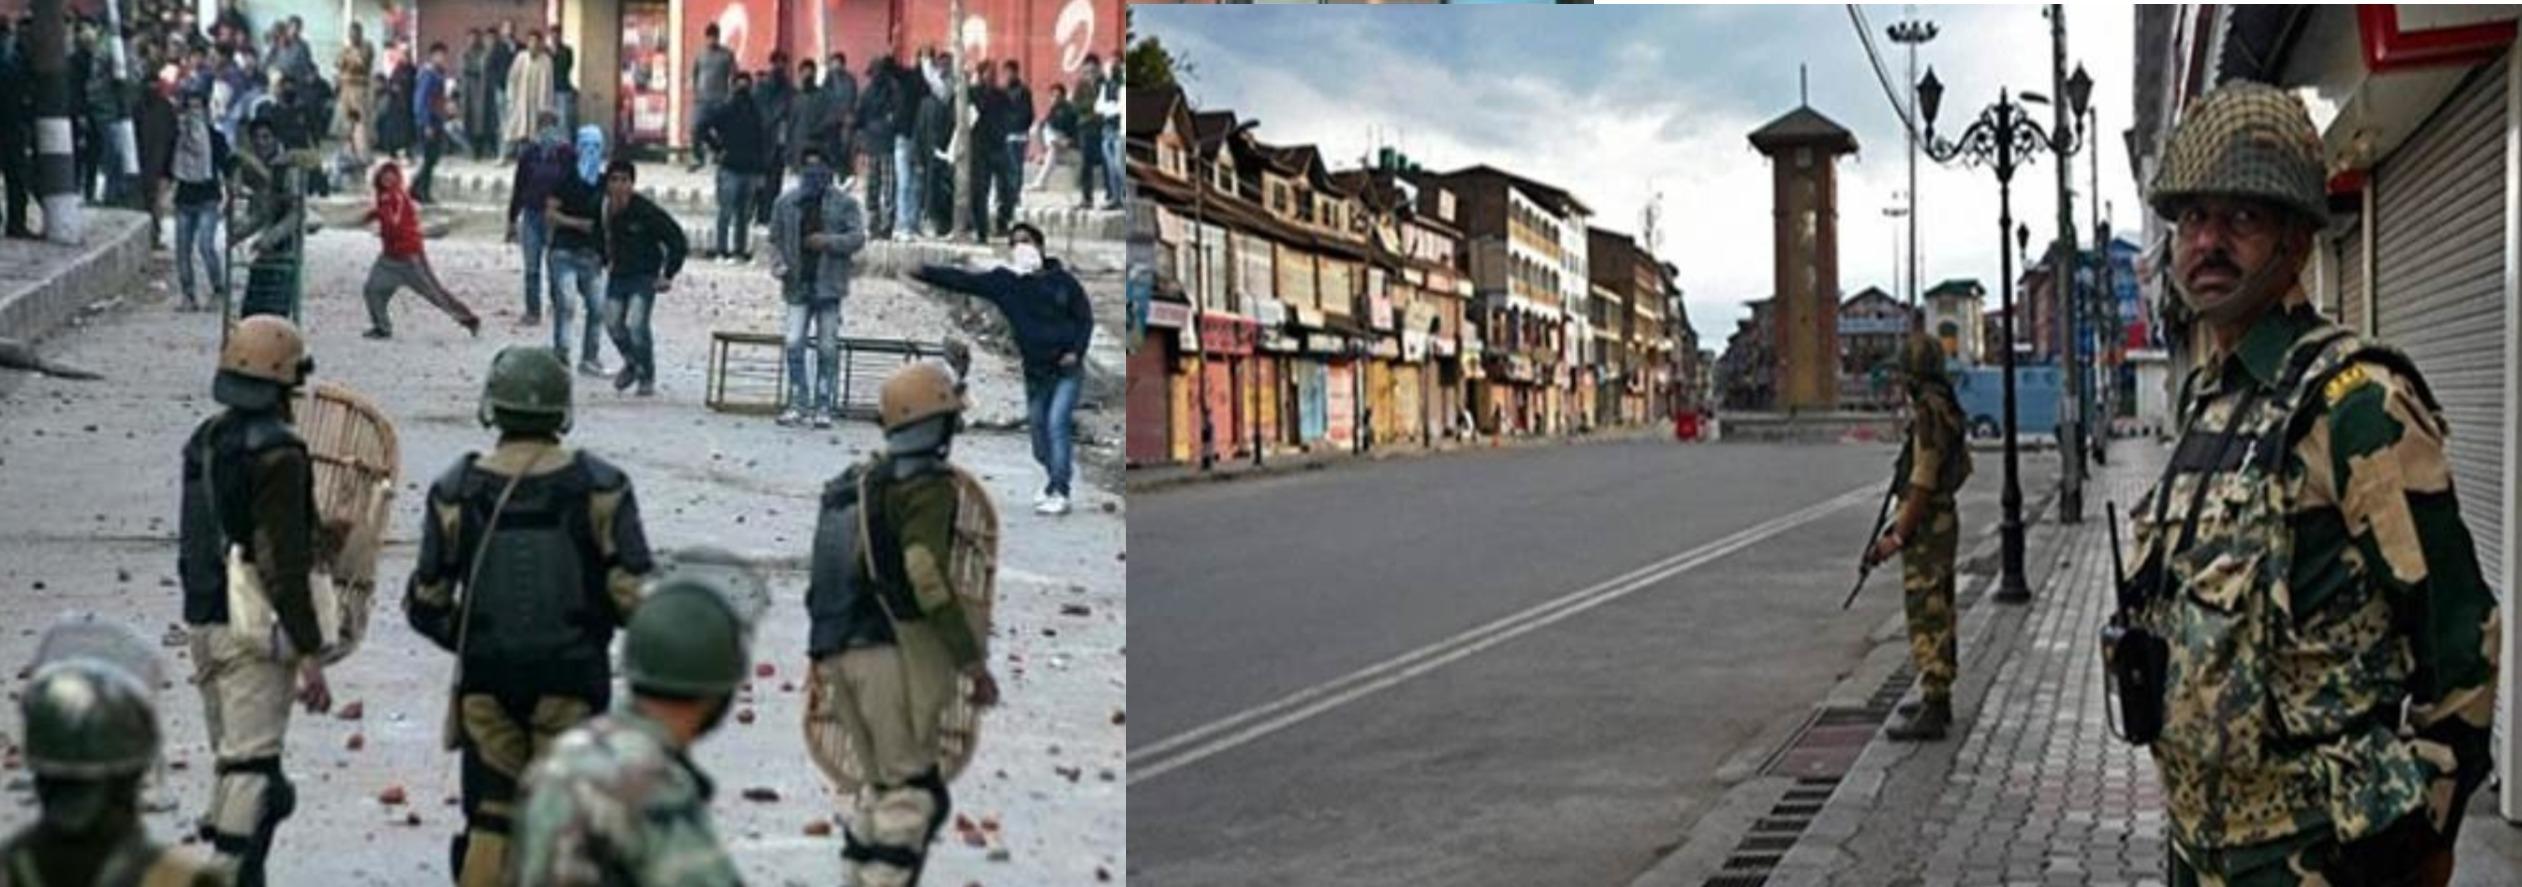 Army Firing Kills 3 civilians including a teenage girl in Kulgam, Curfew Clamped